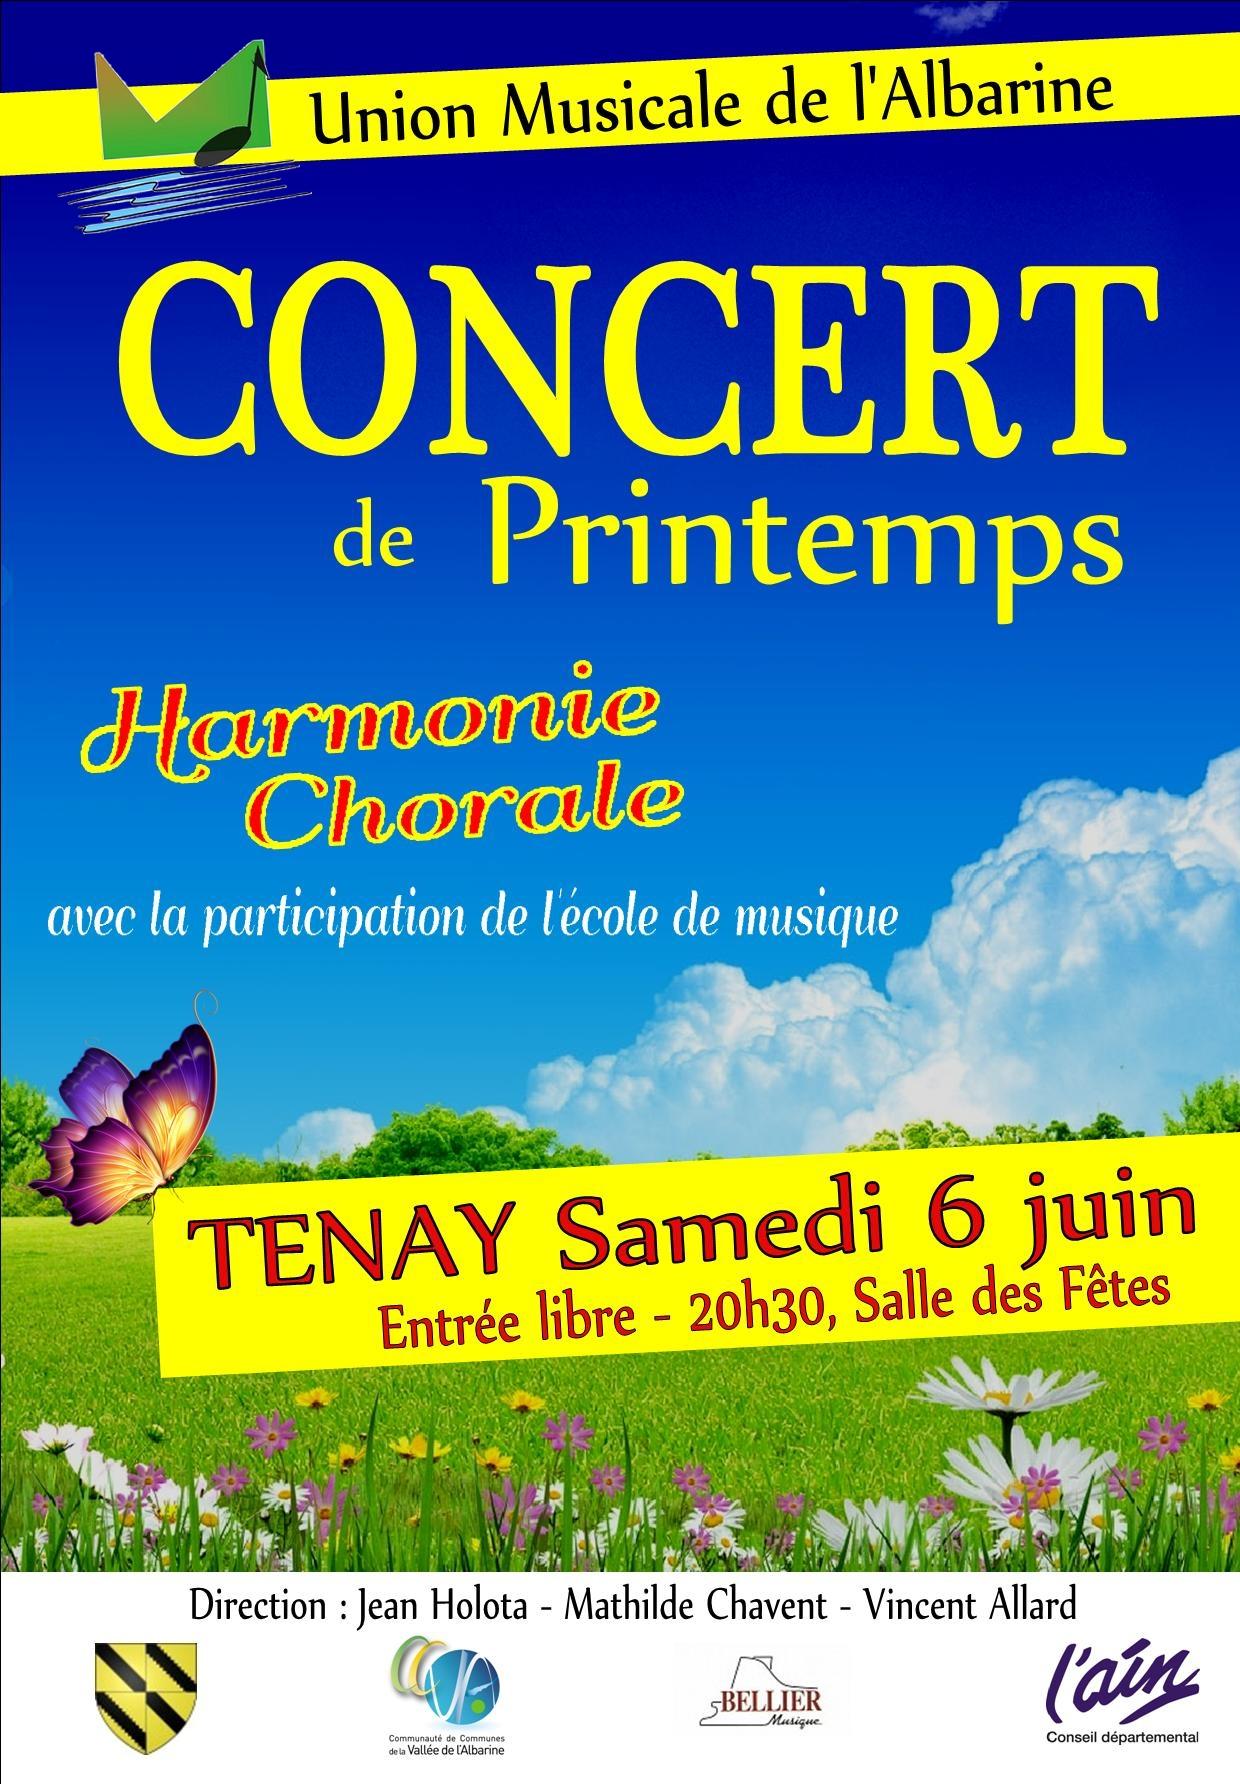 Concert Union Musicale Albarine Tenay 6 juin 2015